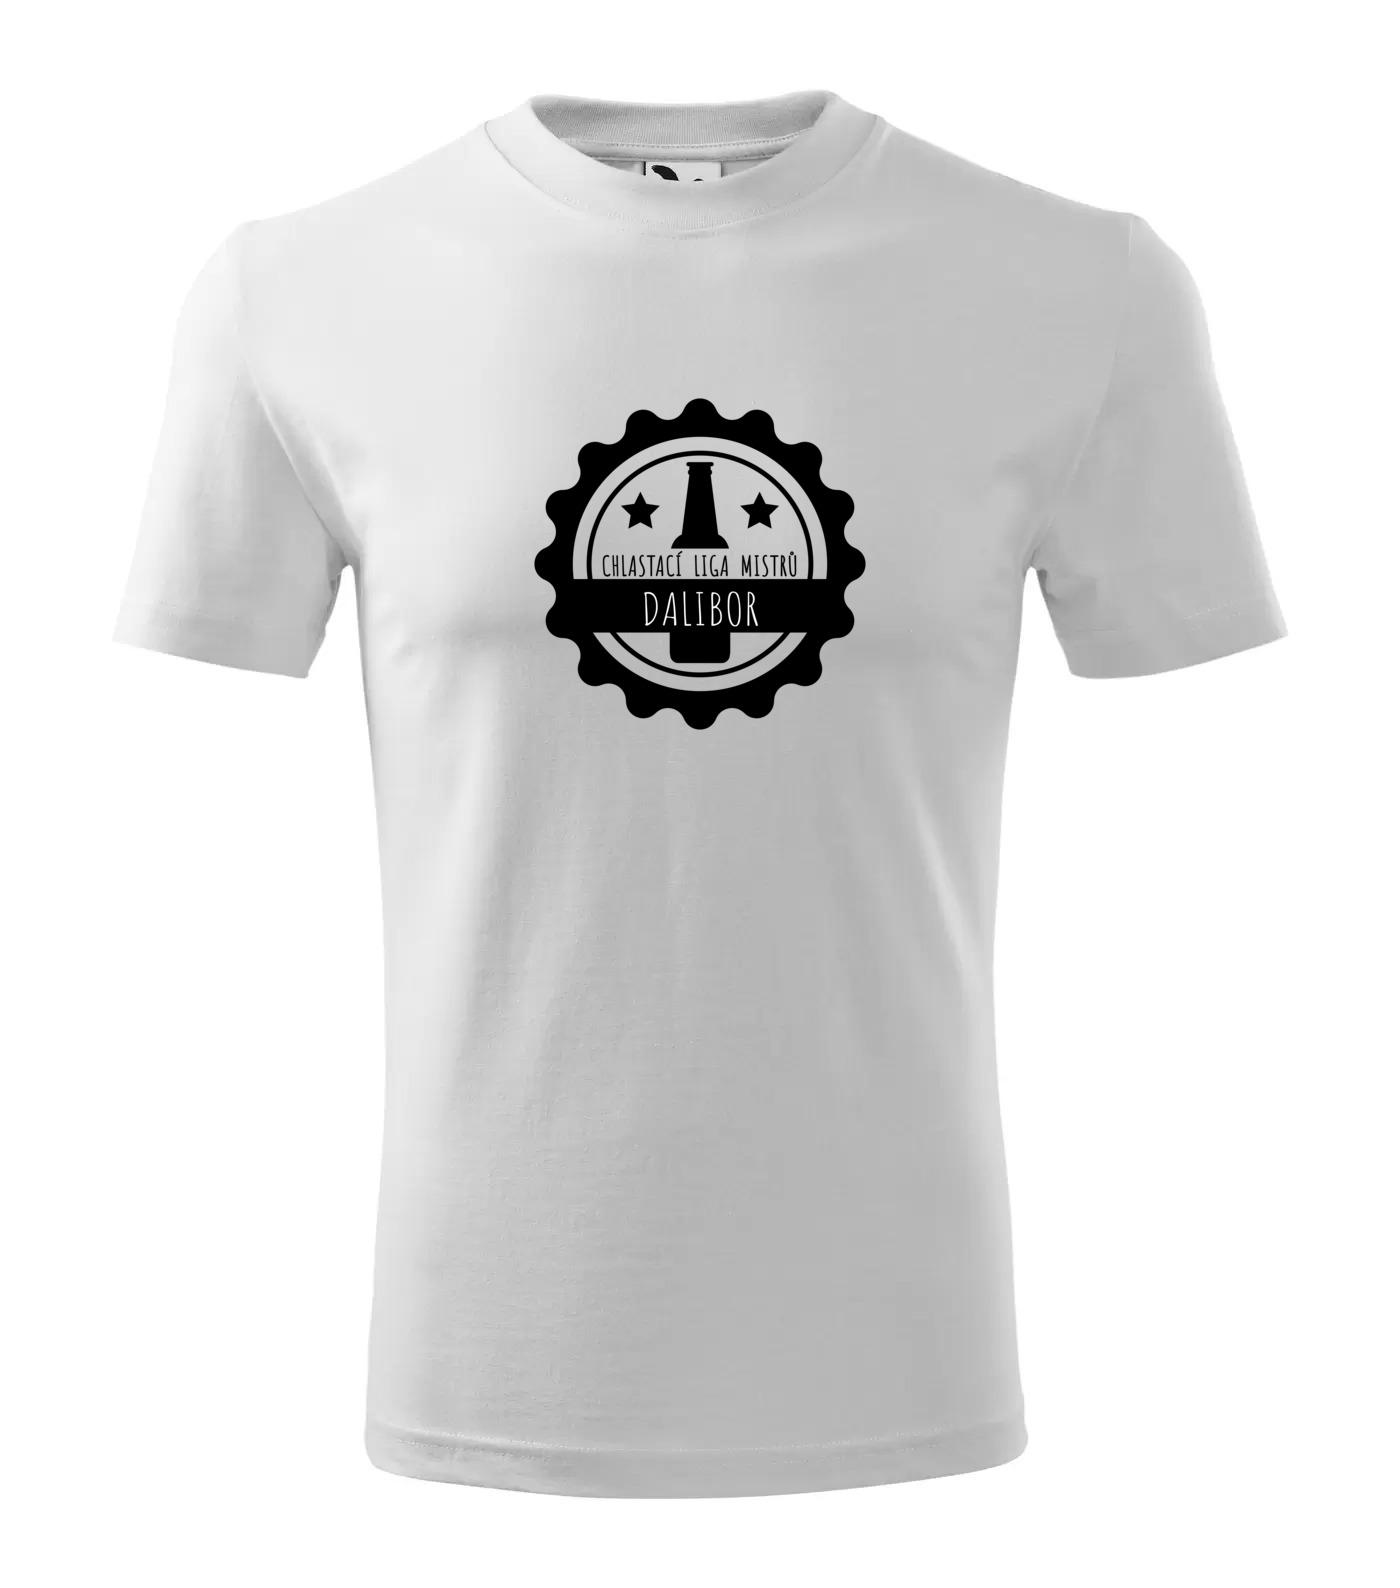 Tričko Chlastací liga mužů Dalibor